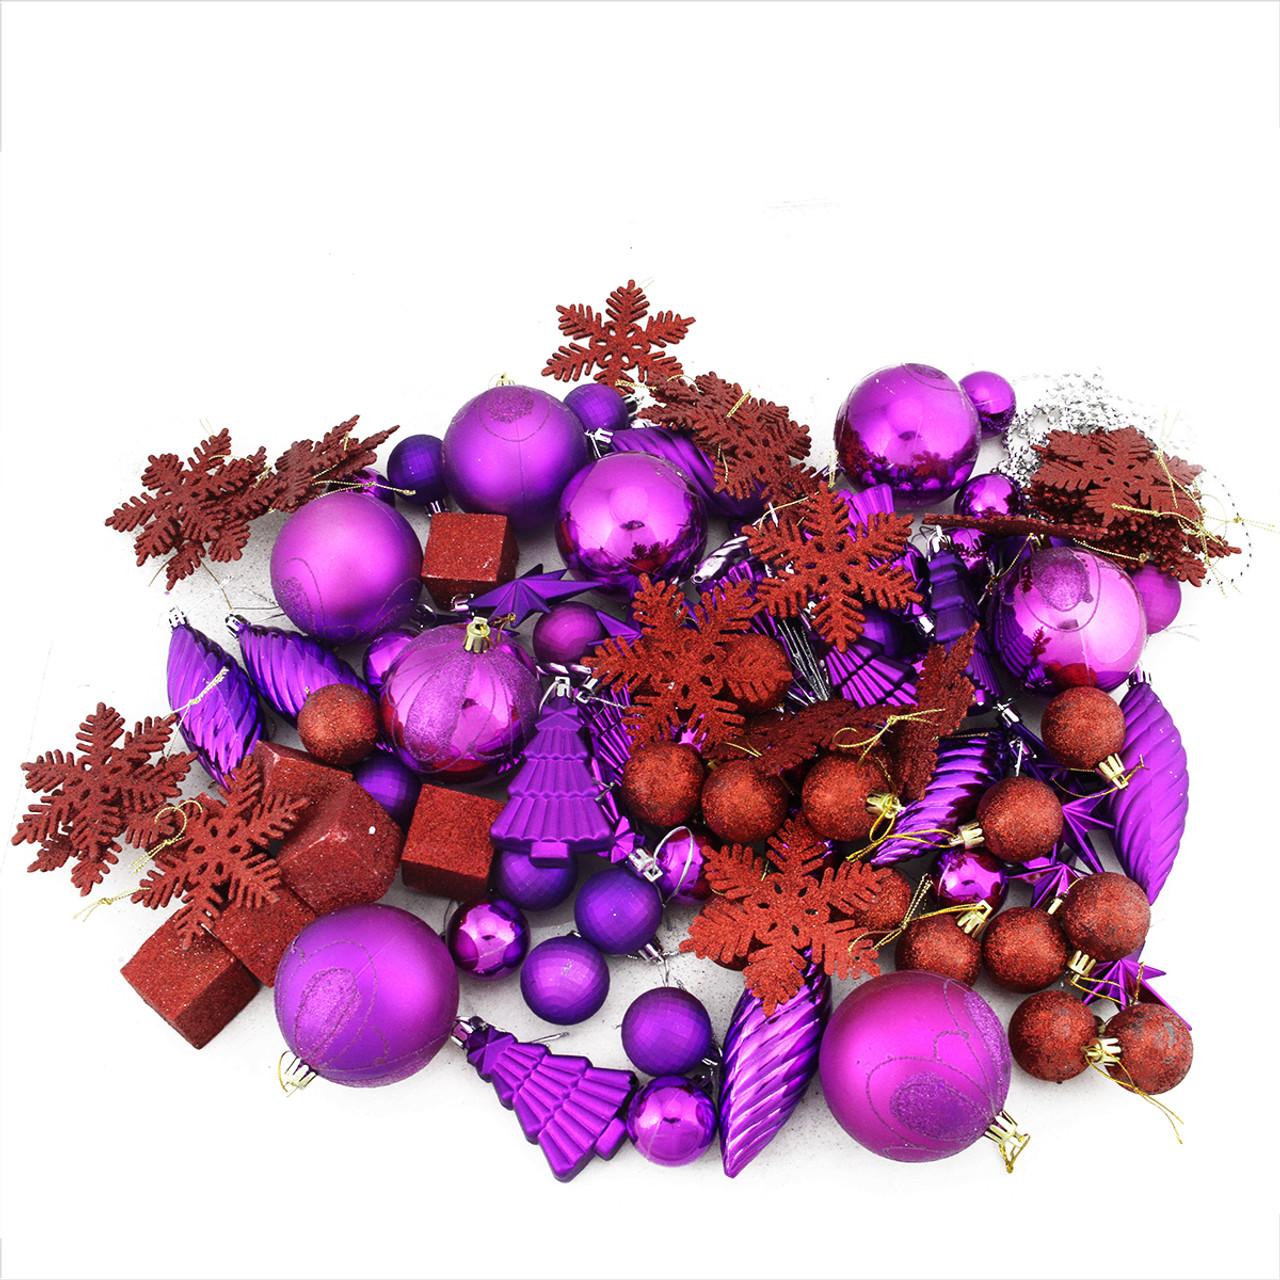 Purple Christmas Decorative 1.5 Inch Globes Set of 24